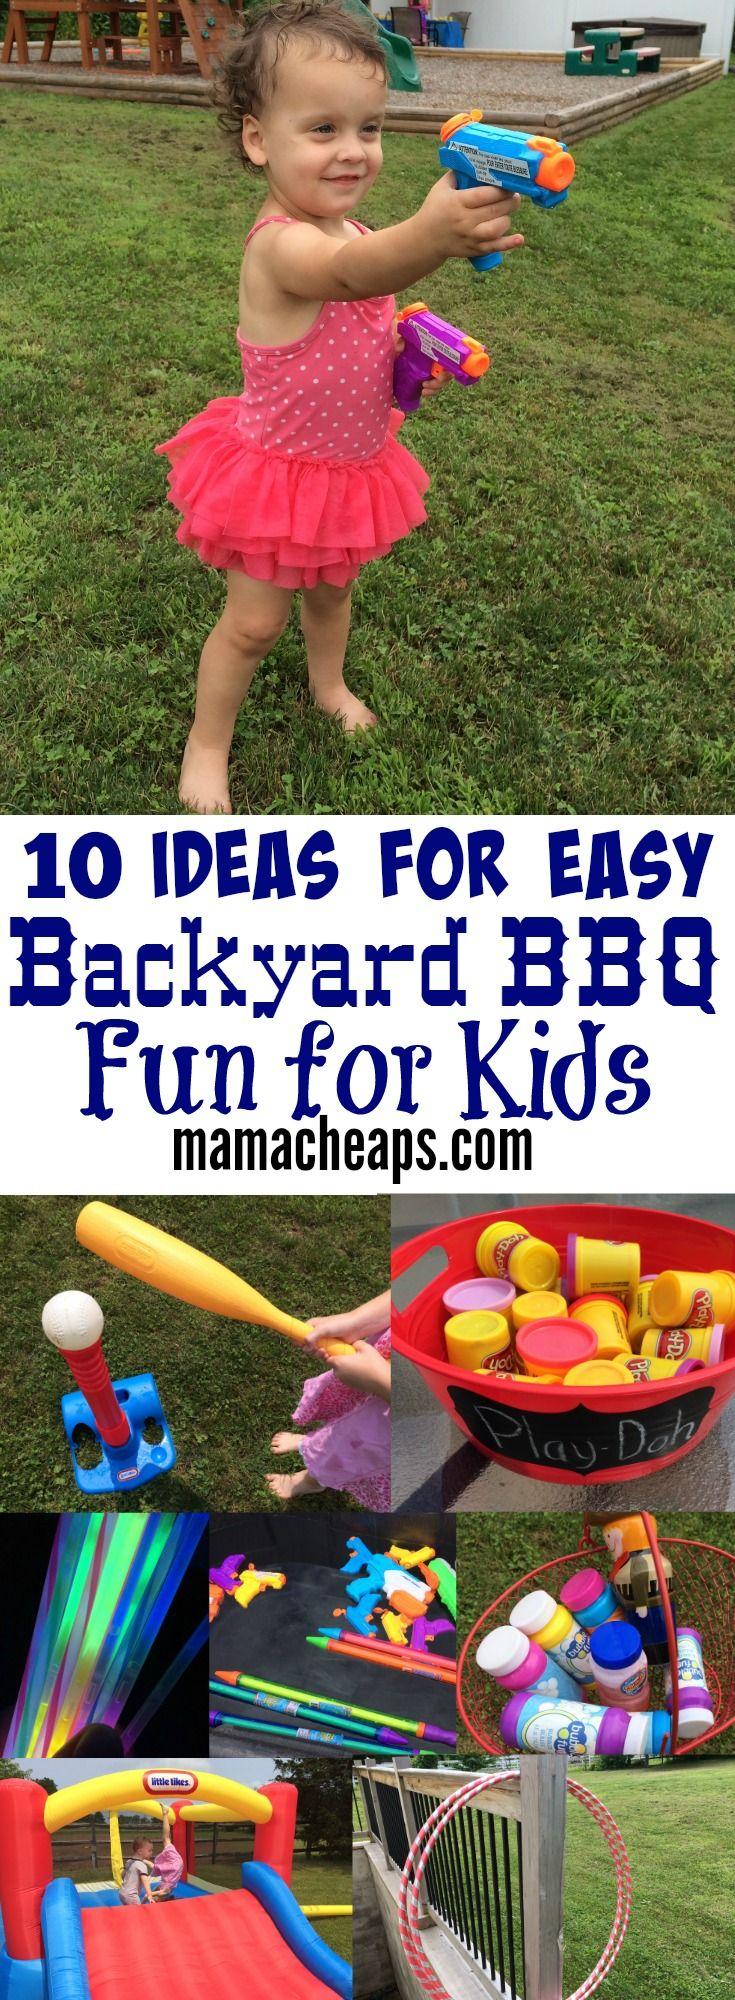 10 Ideas for Easy Backyard BBQ Fun for Kids Mama Cheaps